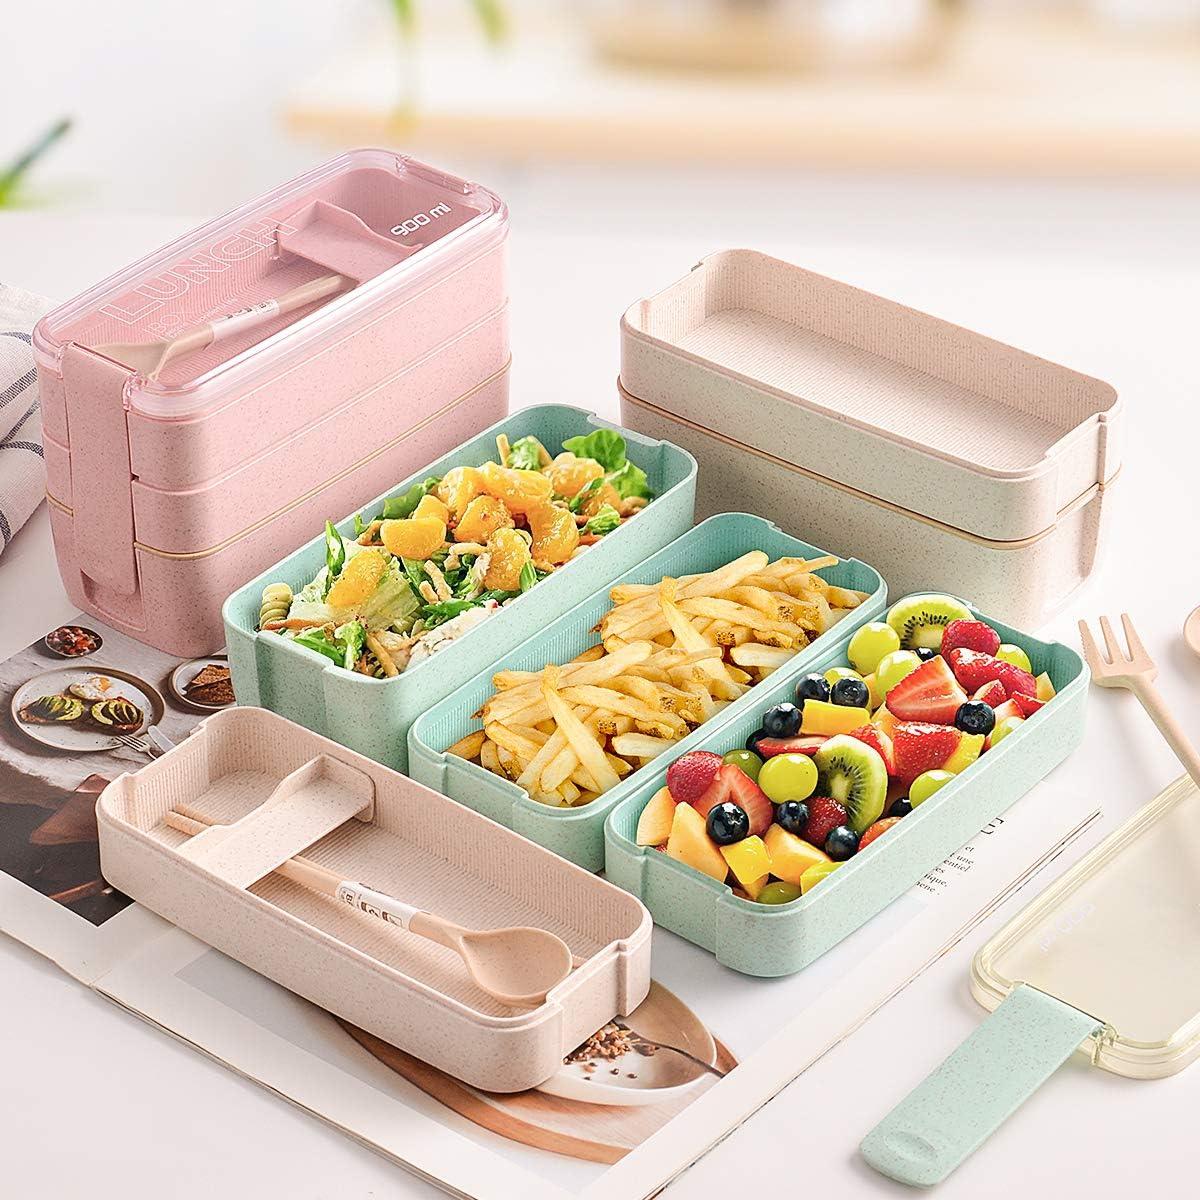 lonchera con utensilios compartimentos 3 en 1 Rosado paja de trigo biodegradable Bento ecol/ógico Caja Hivexagon Bento para ni/ños y adultos